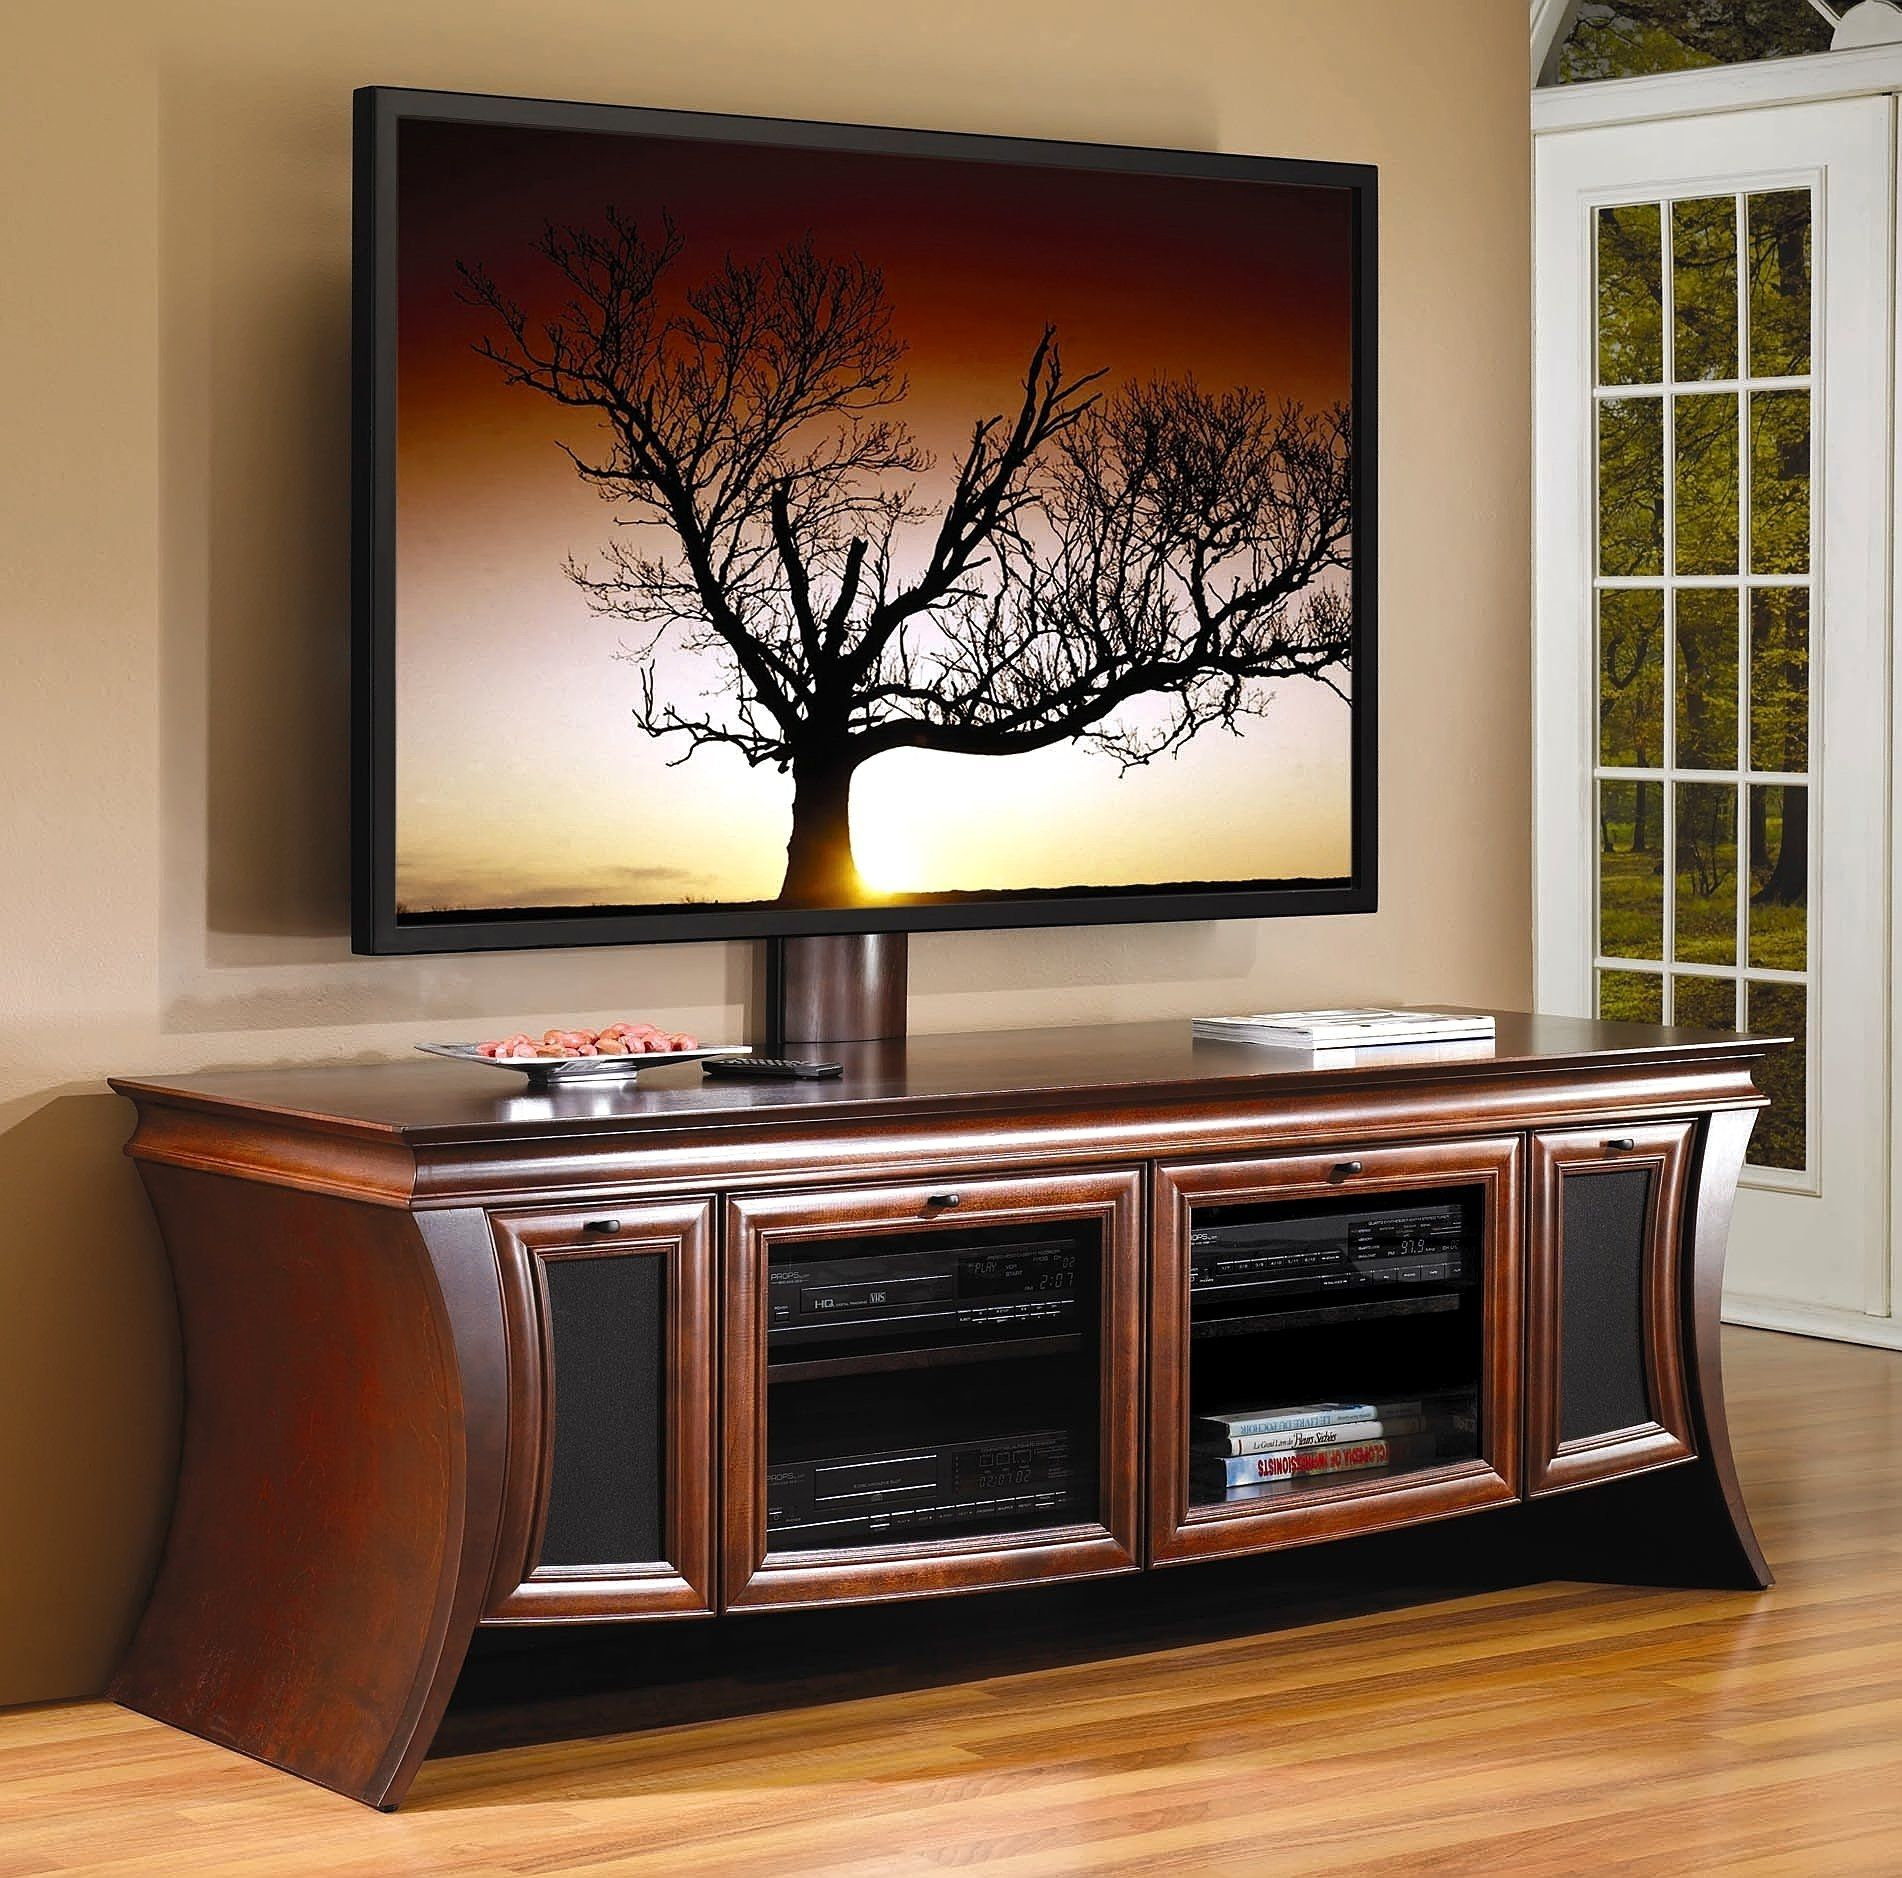 Big Lots Flat Screen Wall Mount Flat screen tv stand, Tv